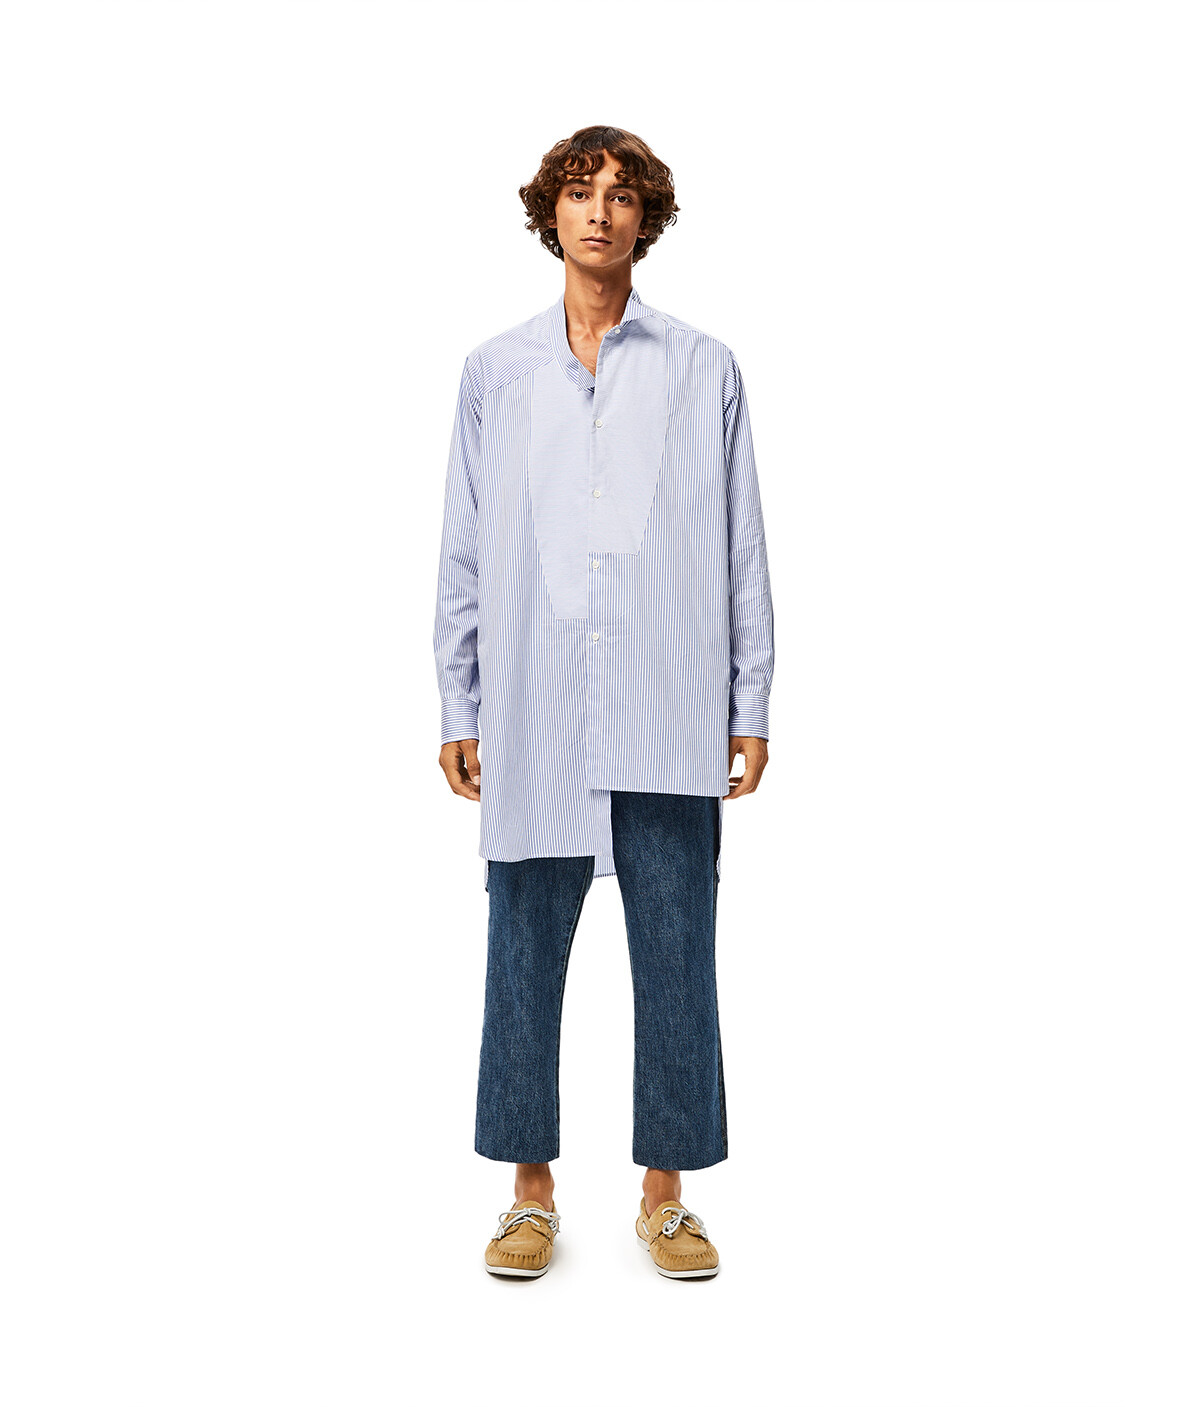 LOEWE New Assymetric Shirt Stripes Blanco/Azul front